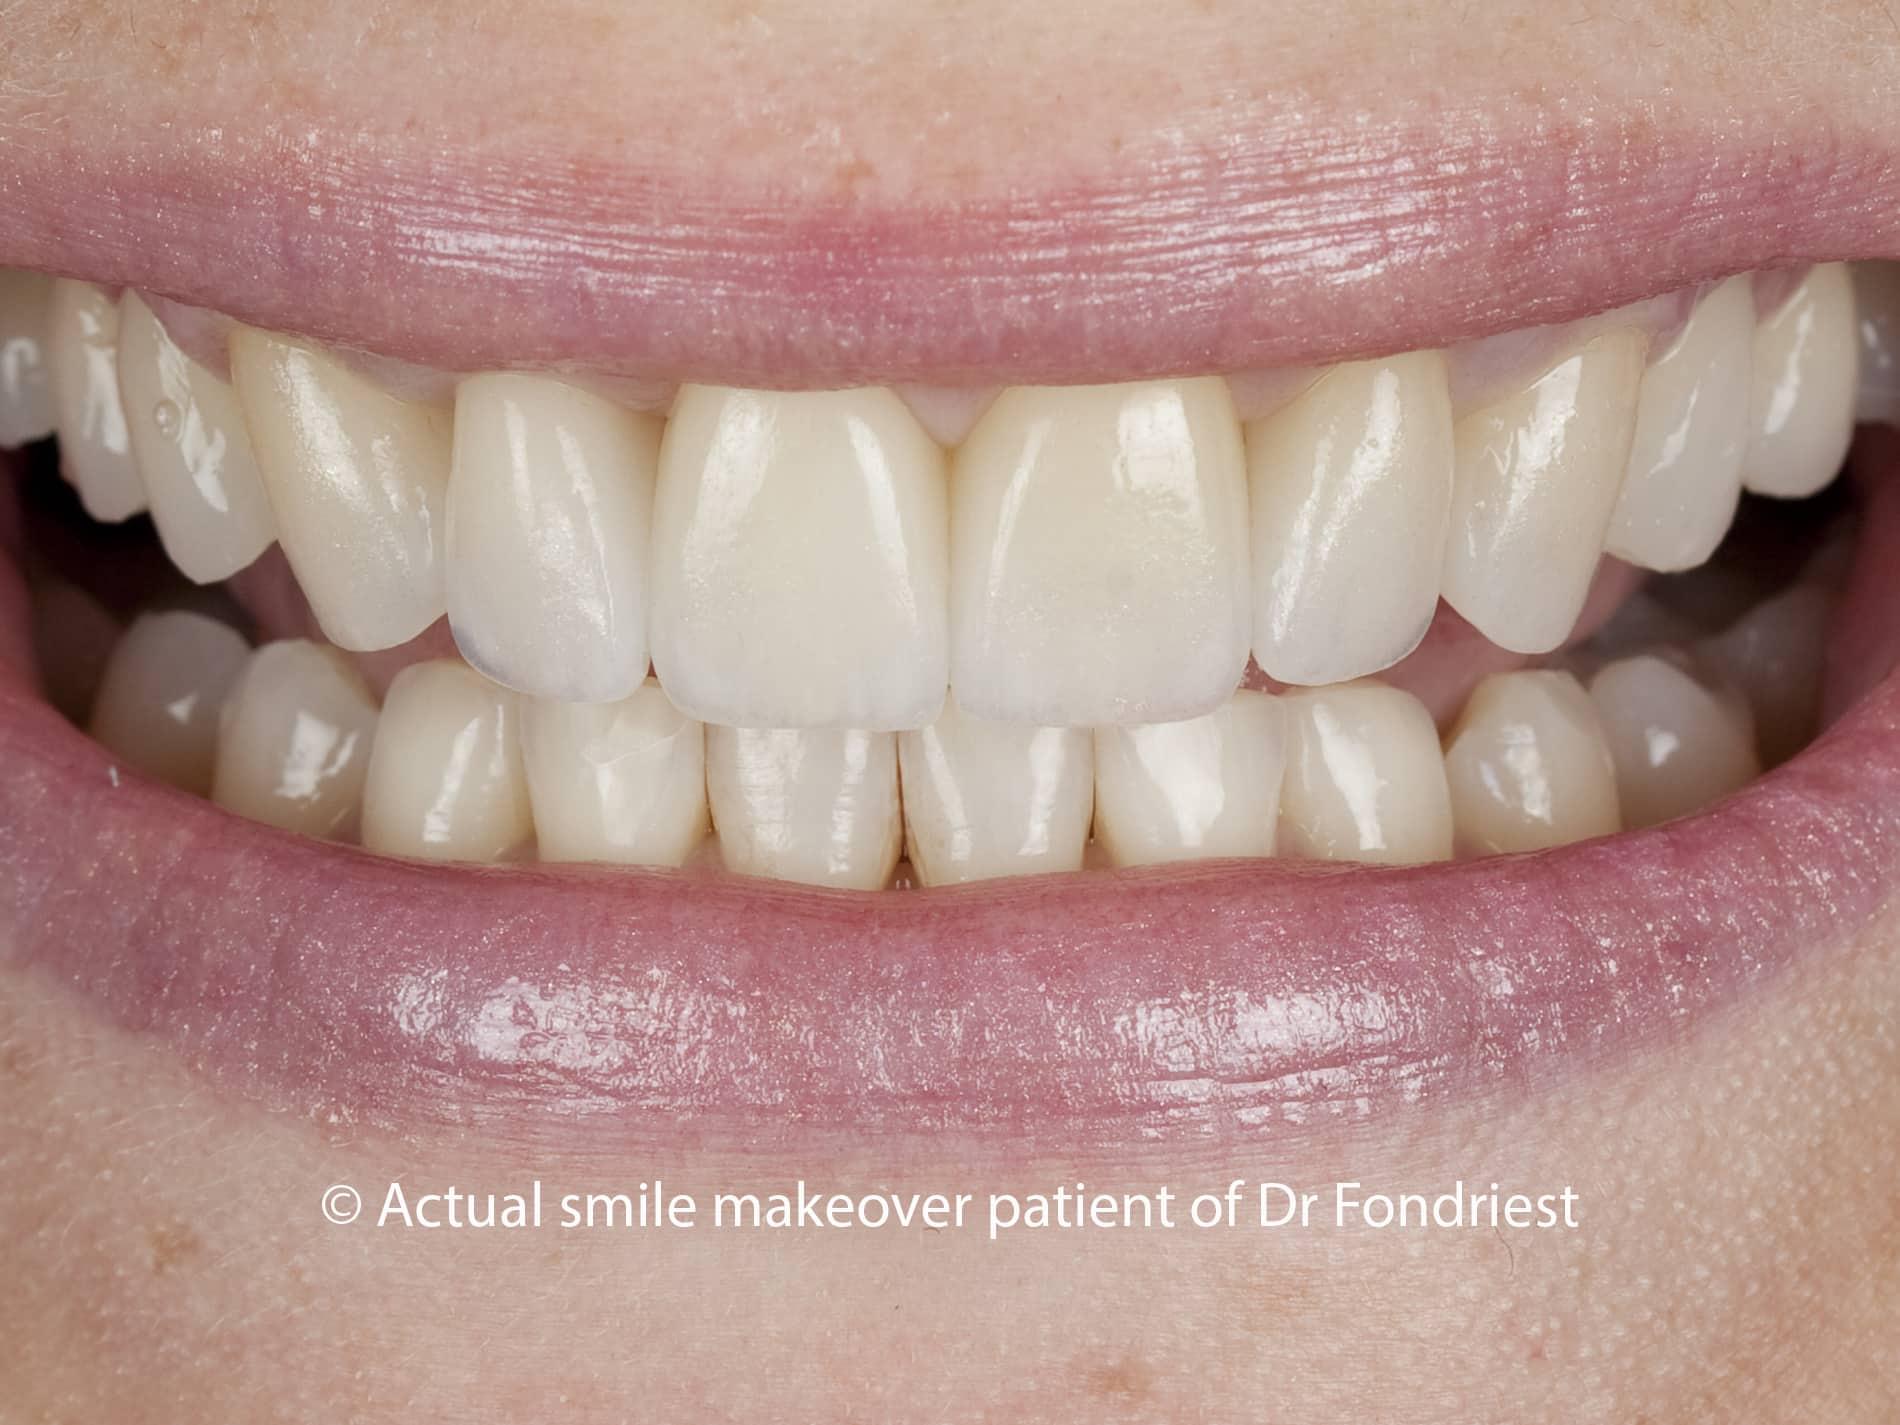 E Max porcelain veneers, Veneers as alternative to orthodontics